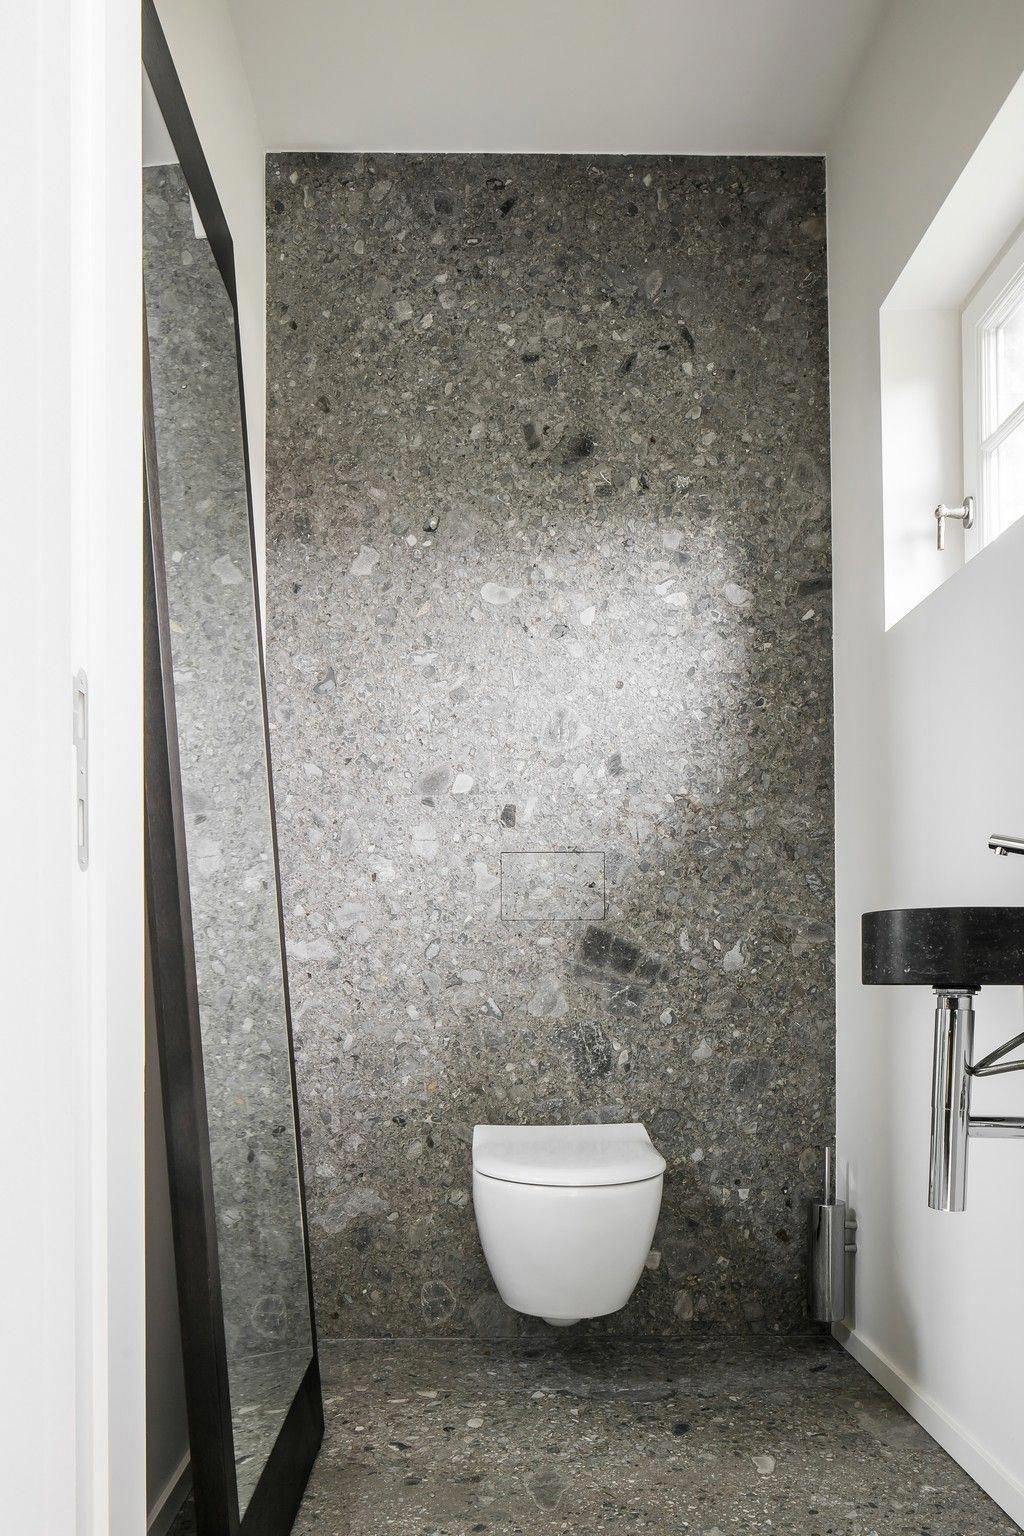 Living Room Decor And Design Ideas Basement Bathroom Remodeling Bathroom Interior Mold In Bathroom